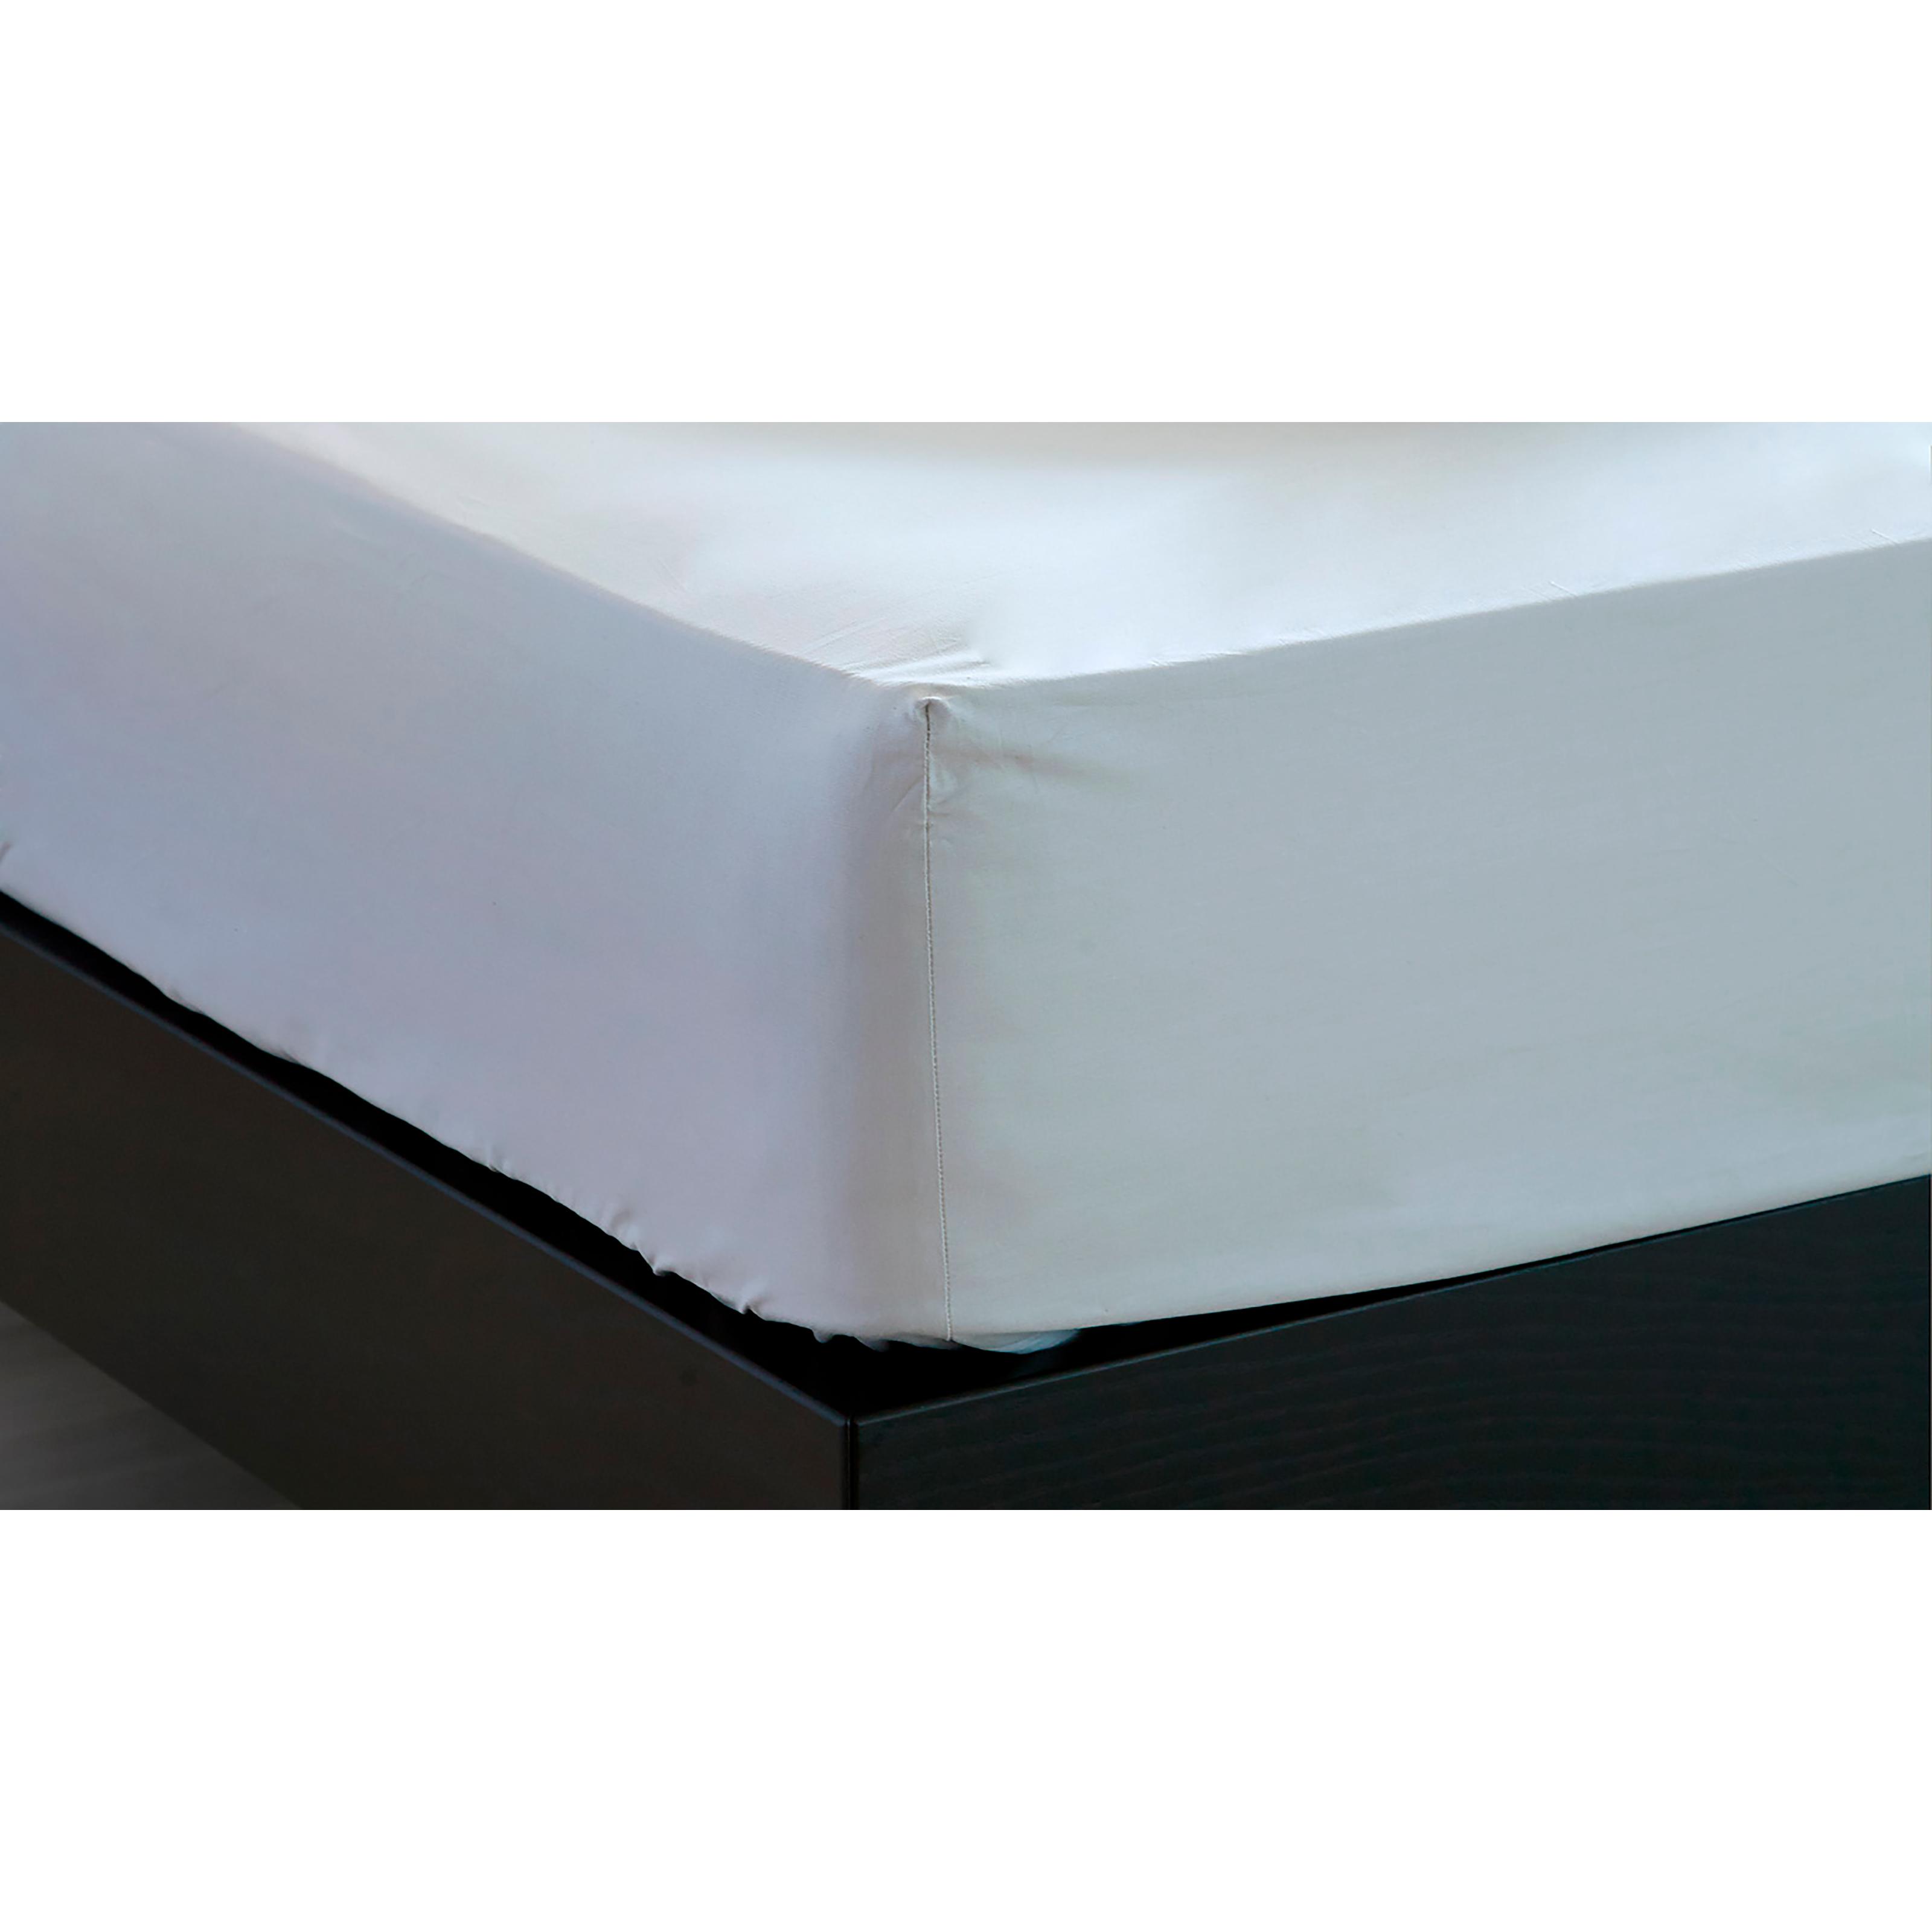 Image of   Unikka faconlagen 200x100x20 cm hvid/satin